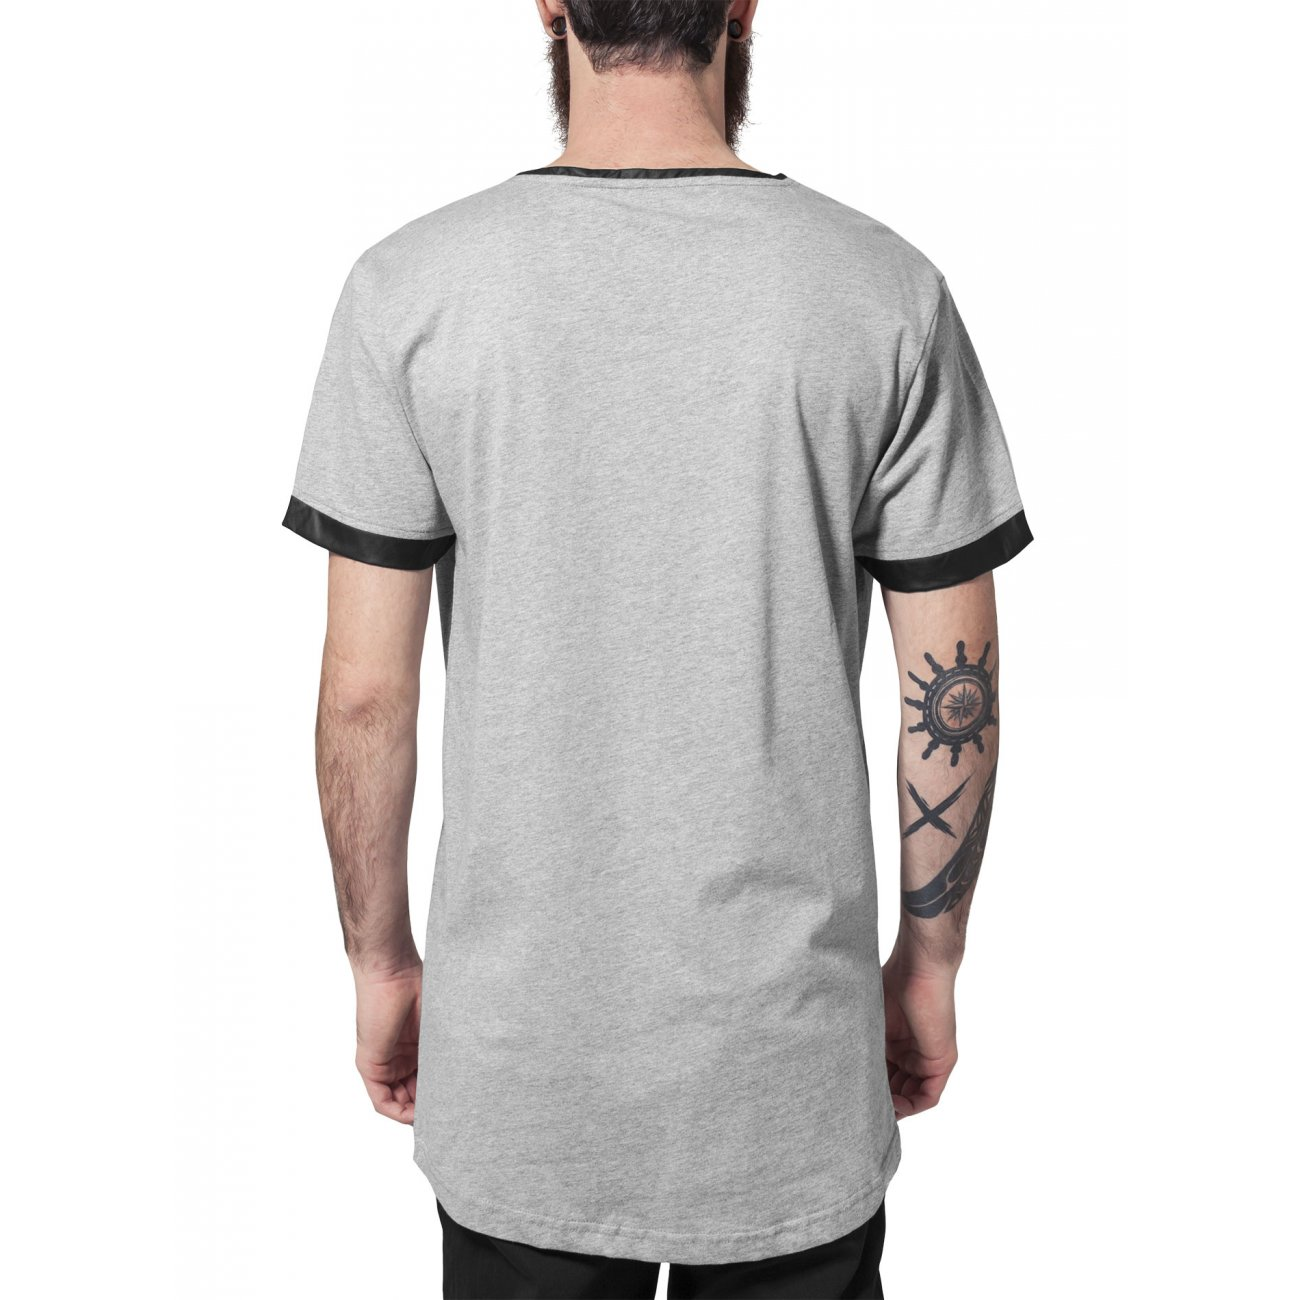 urban classics t shirt herren long shaped kunstleder patch shirt tb 8. Black Bedroom Furniture Sets. Home Design Ideas